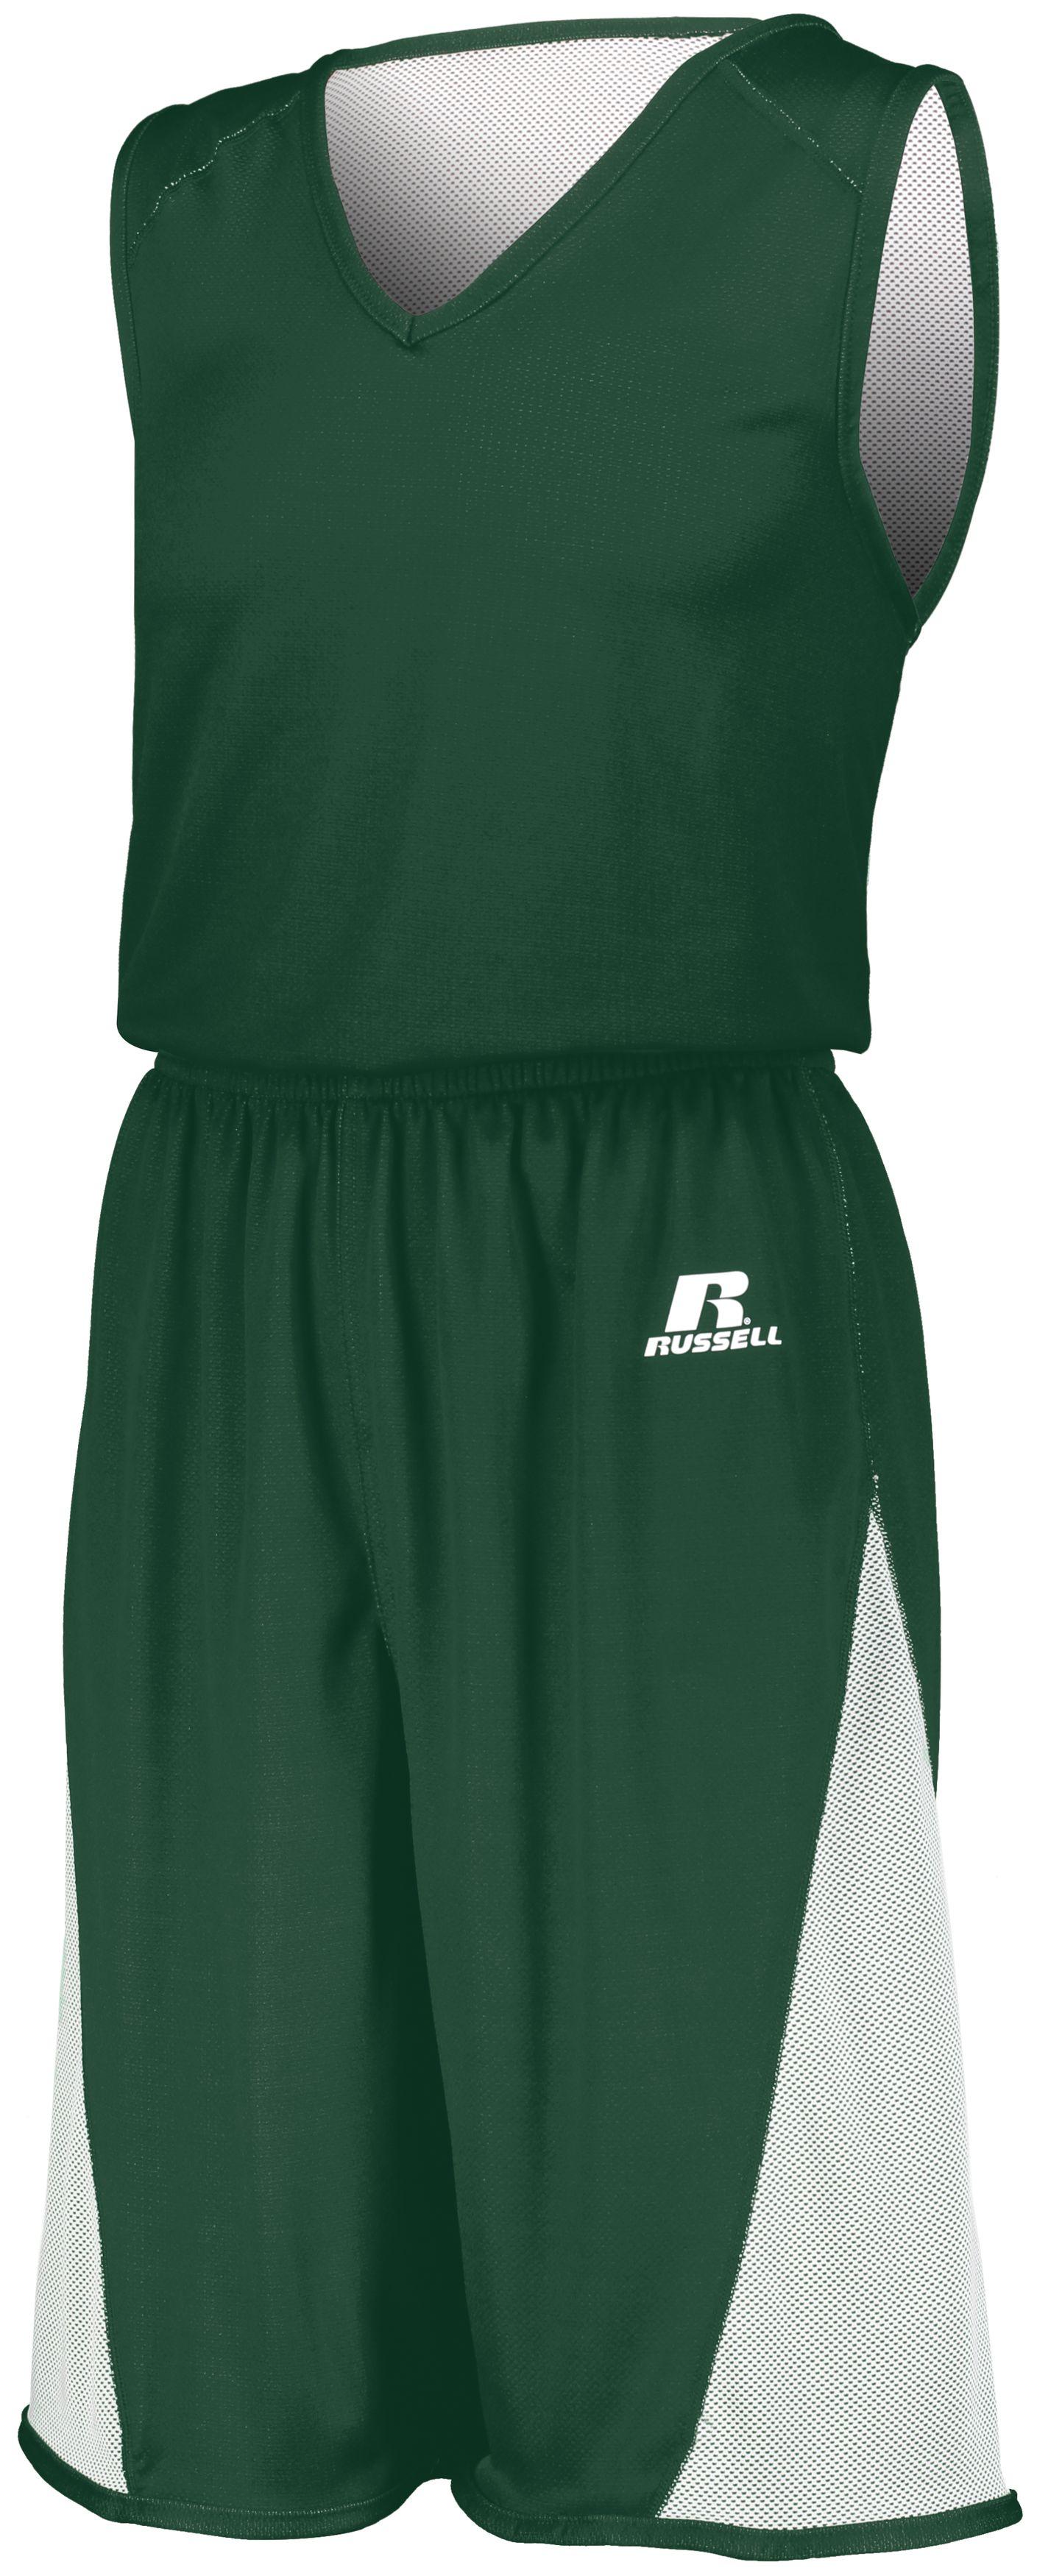 Undivided Single Ply Reversible Shorts - DARK GREEN/WHITE